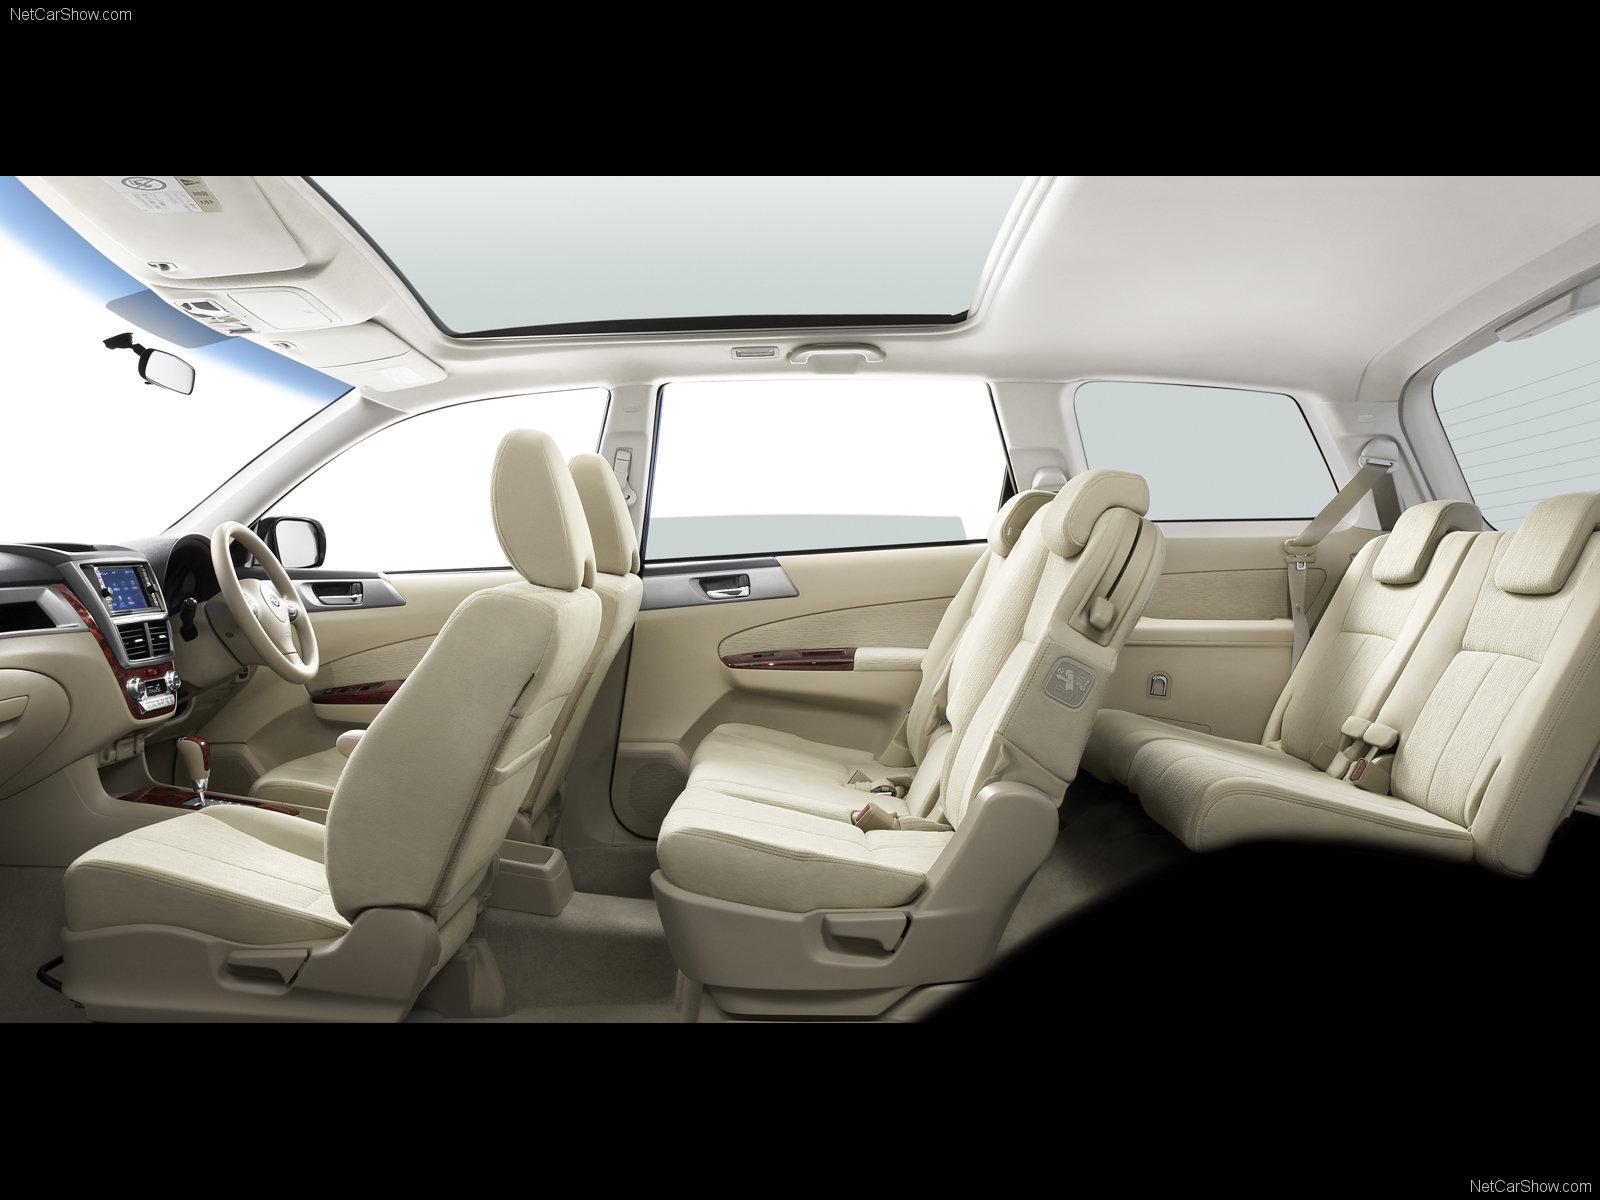 Subaru Exiga photos  PhotoGallery with 16 pics CarsBasecom